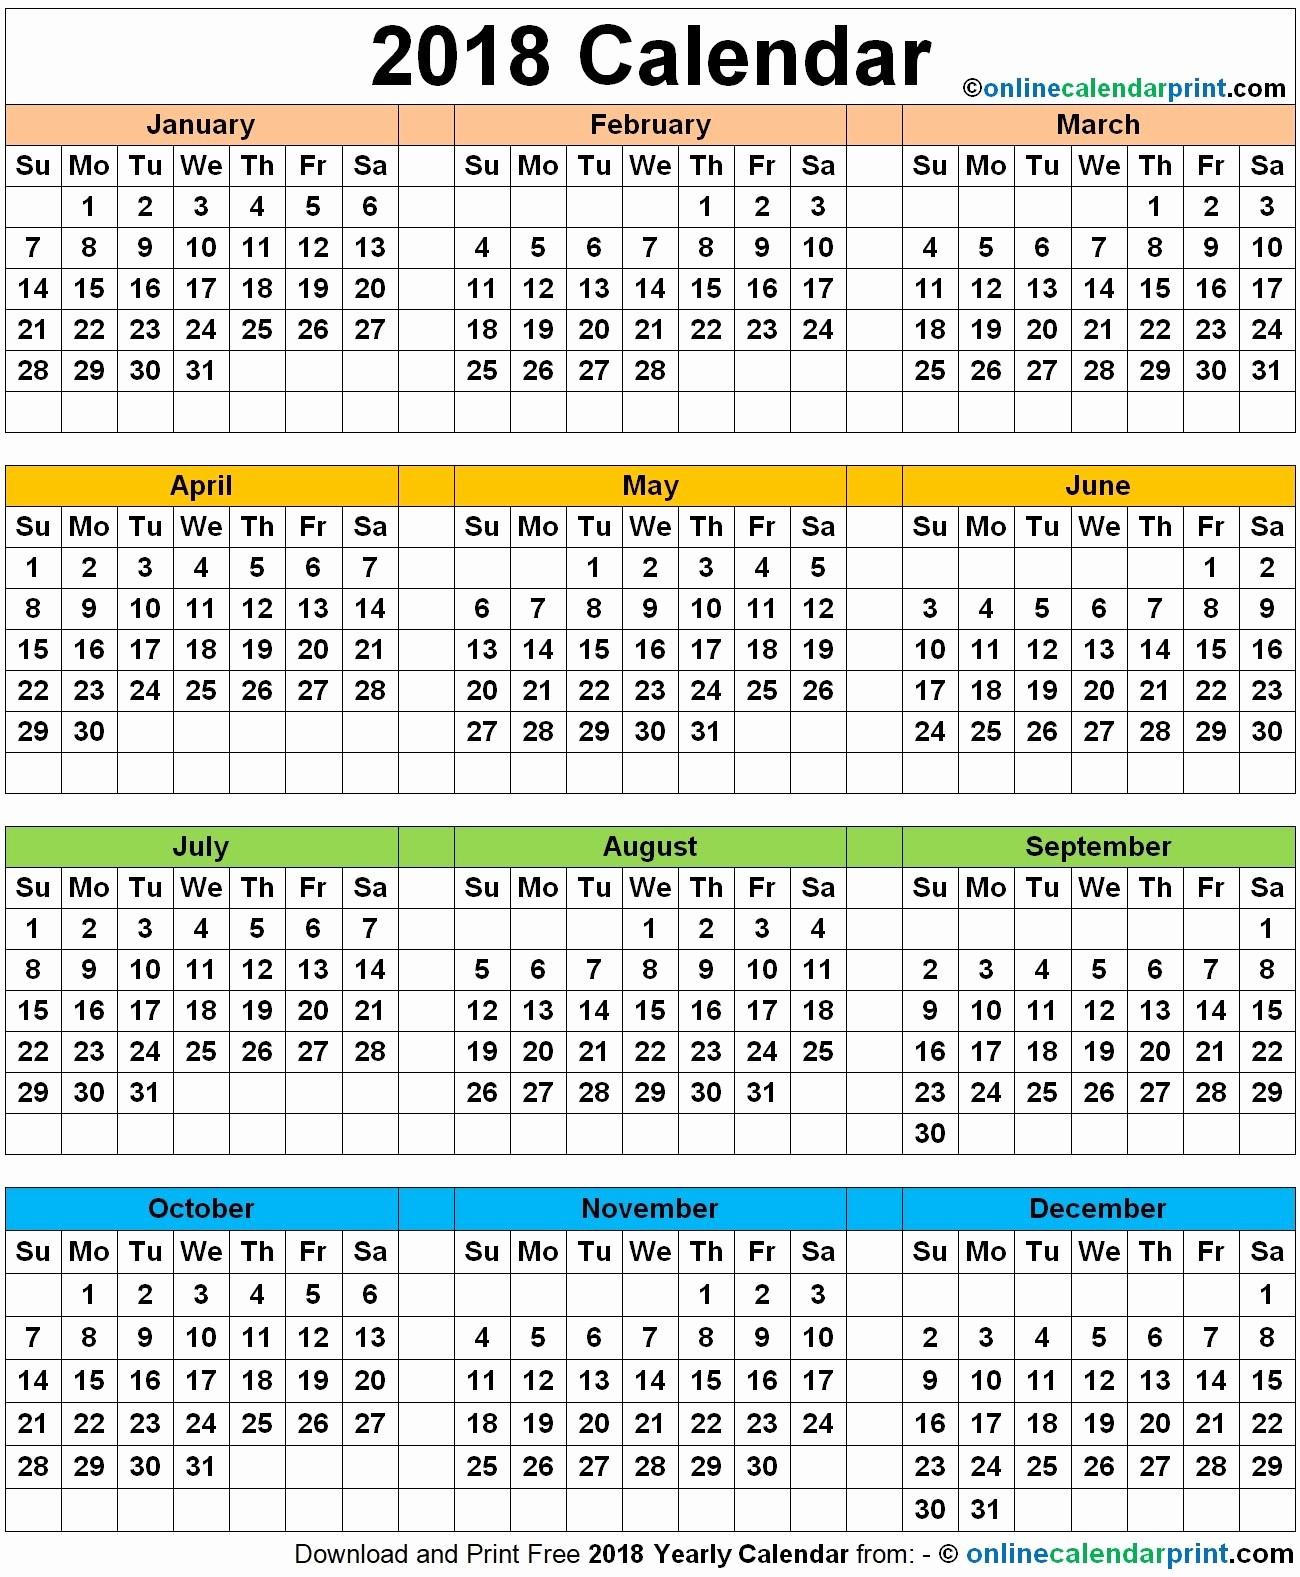 12 Month Printable Calendar 2018 New 12 Month 2018 Calendar Printable Full Page – Calendar